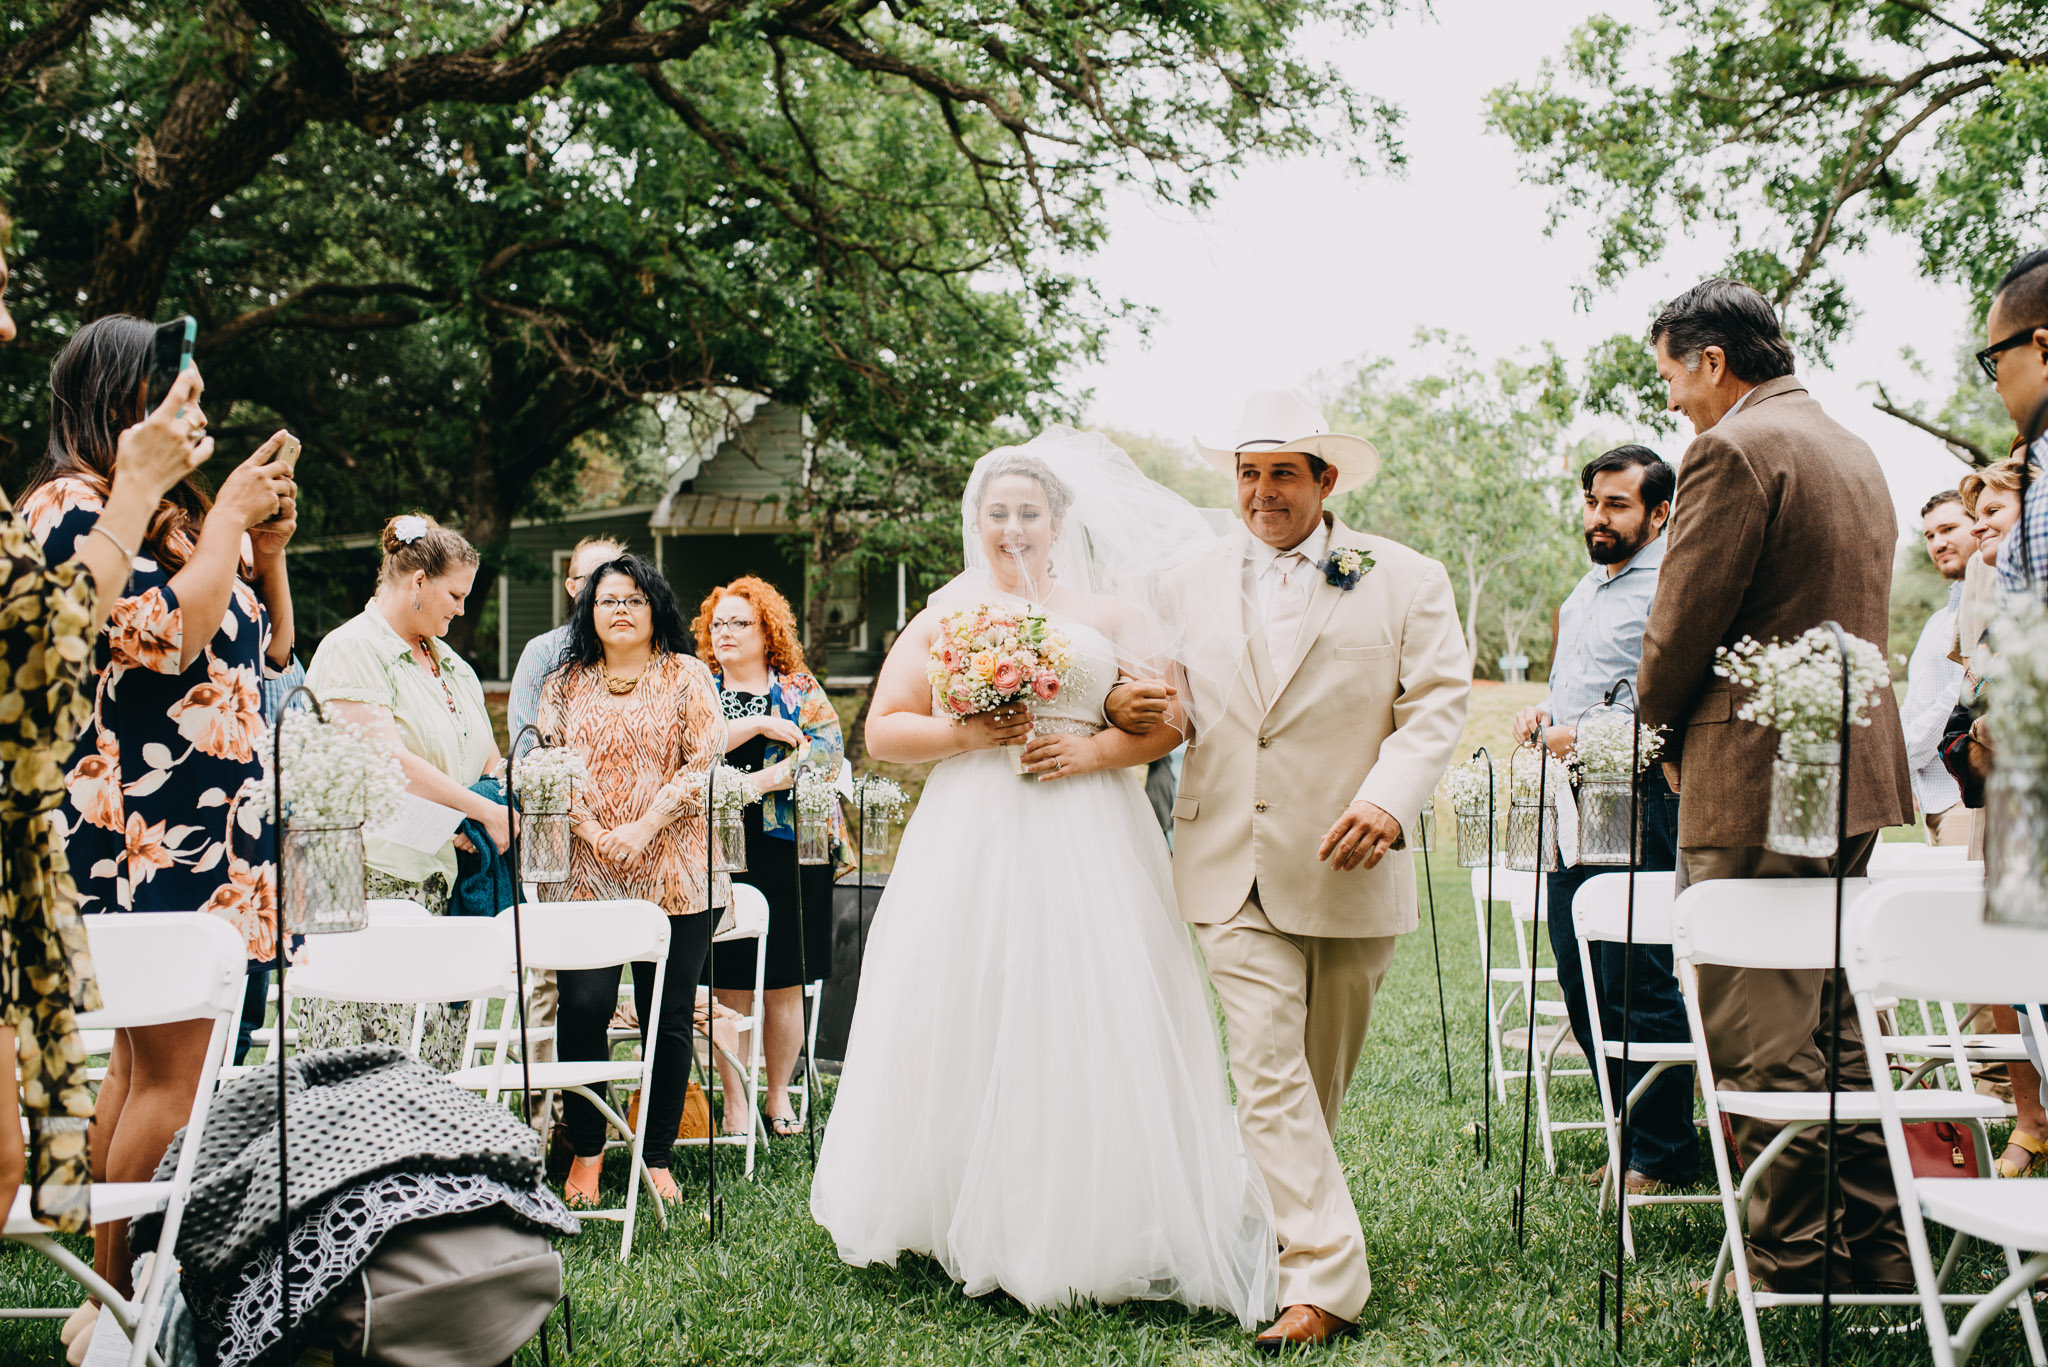 Christoval-Texas-Wedding_Photographer-Meghan&Tony-0011.jpg